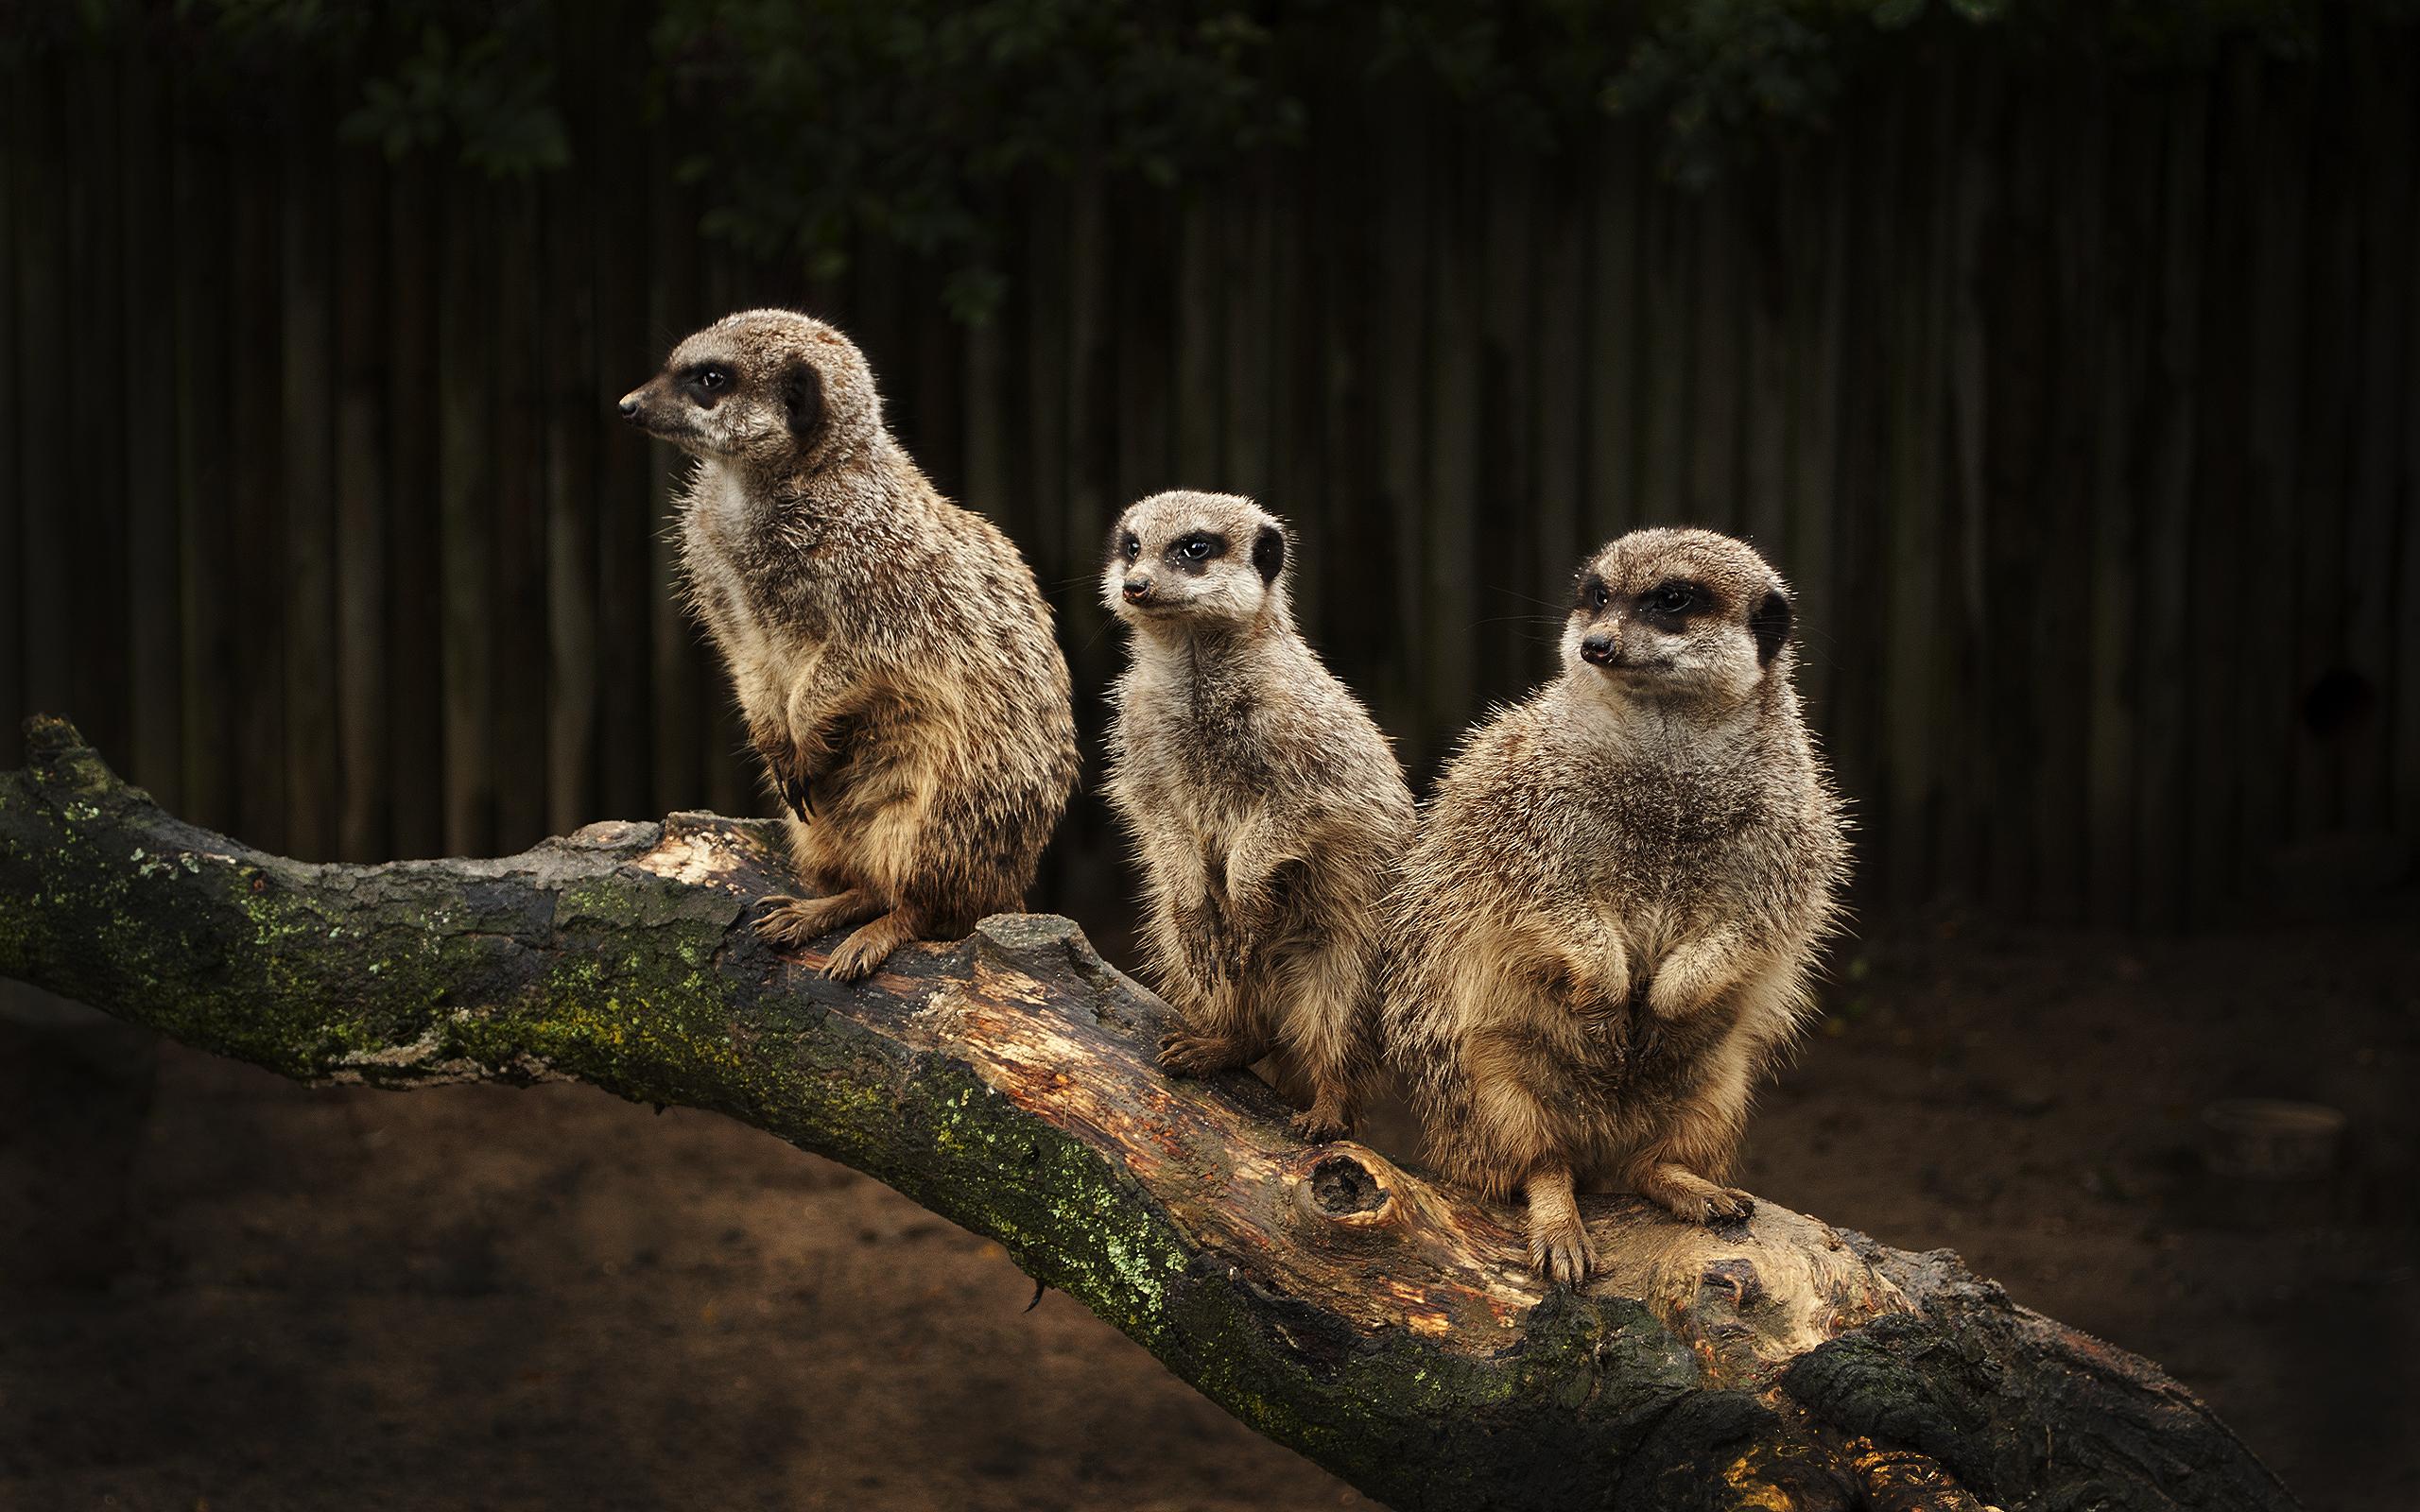 meerkat animal